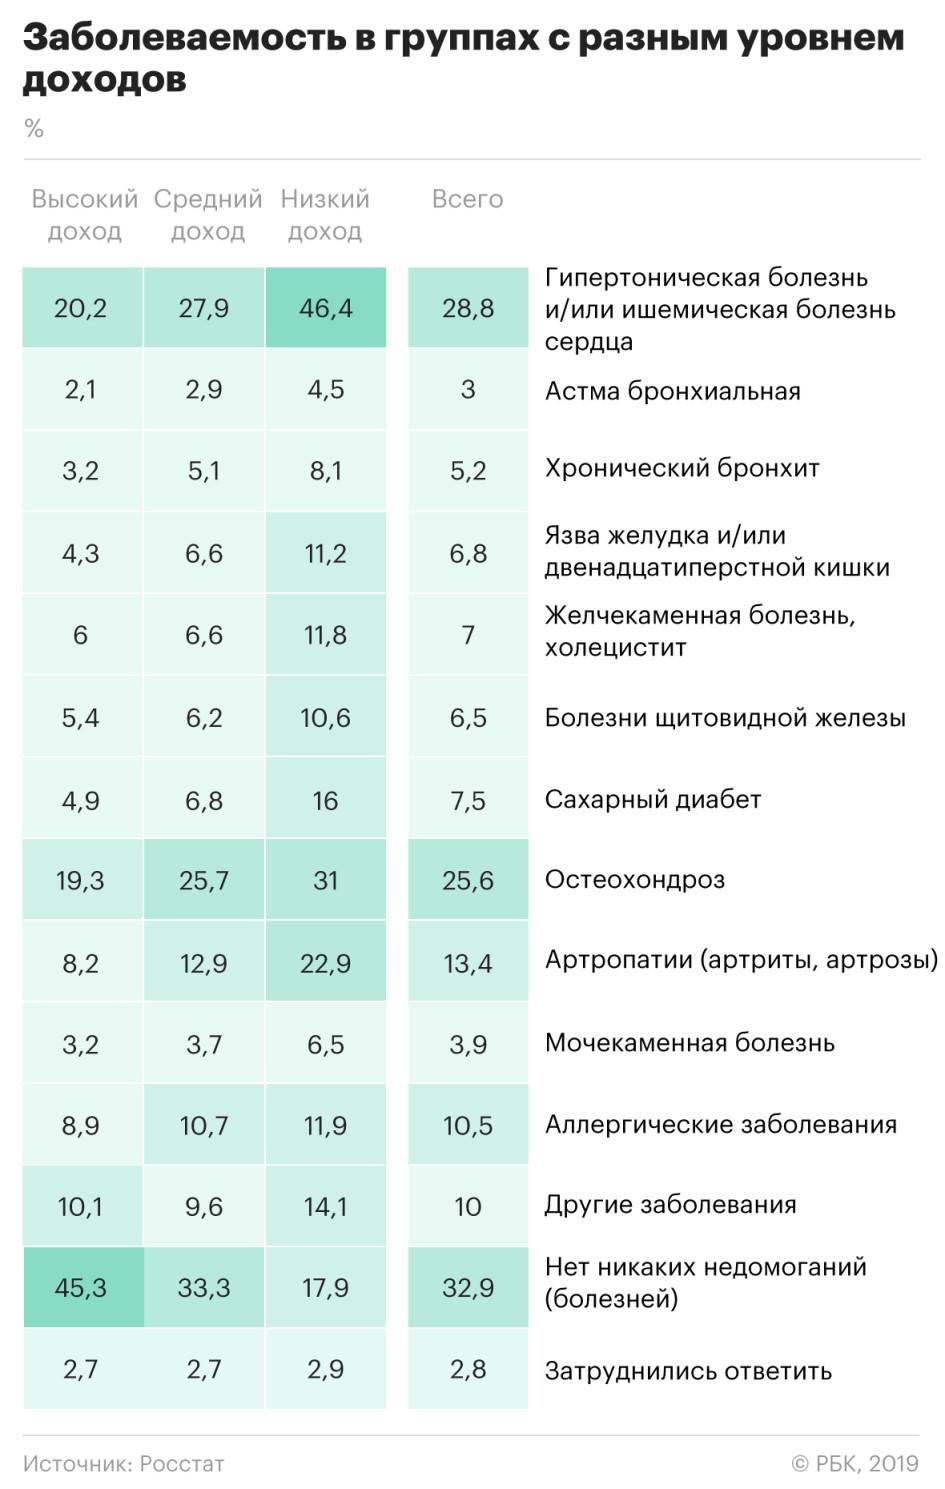 https://s0.rbk.ru/v6_top_pics/resized/945xH/media/img/9/56/755530610147569.jpeg